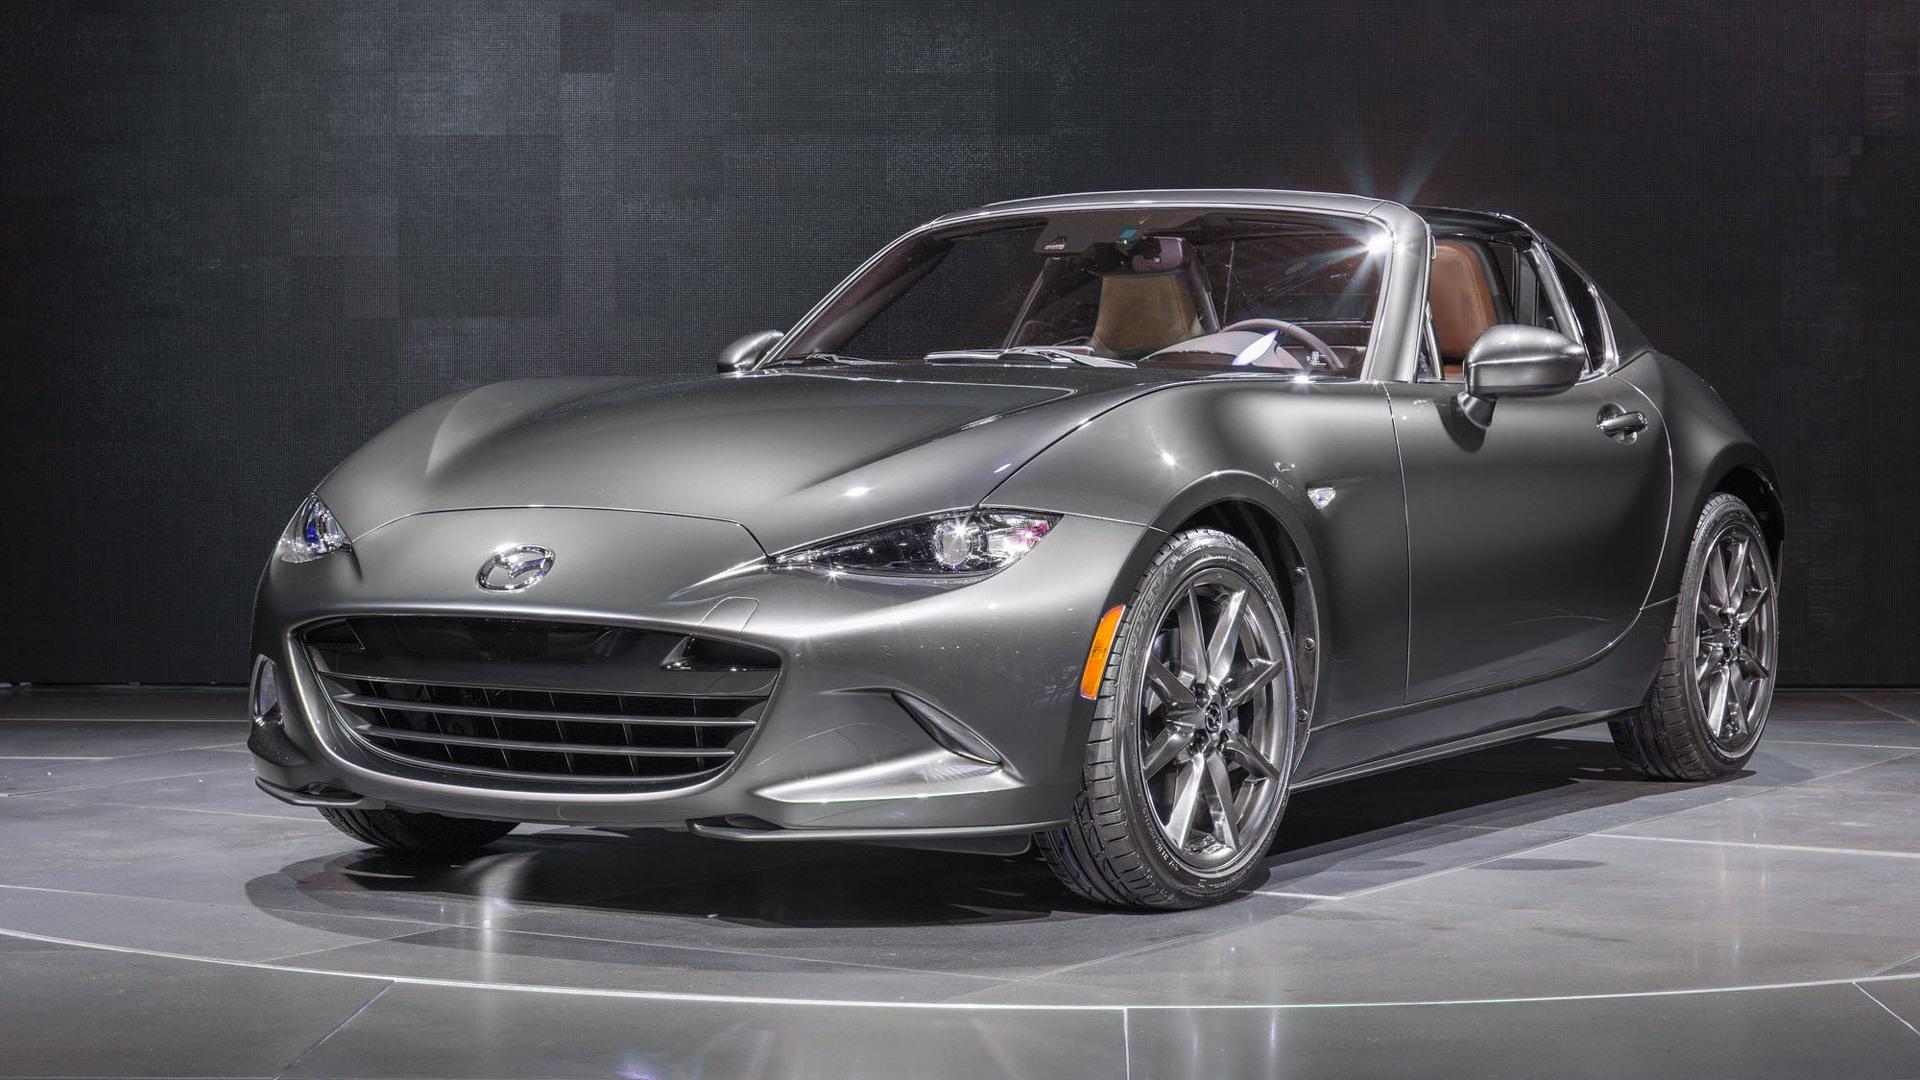 2017 Mazda MX-5 Miata RF to get limited-run Launch Edition